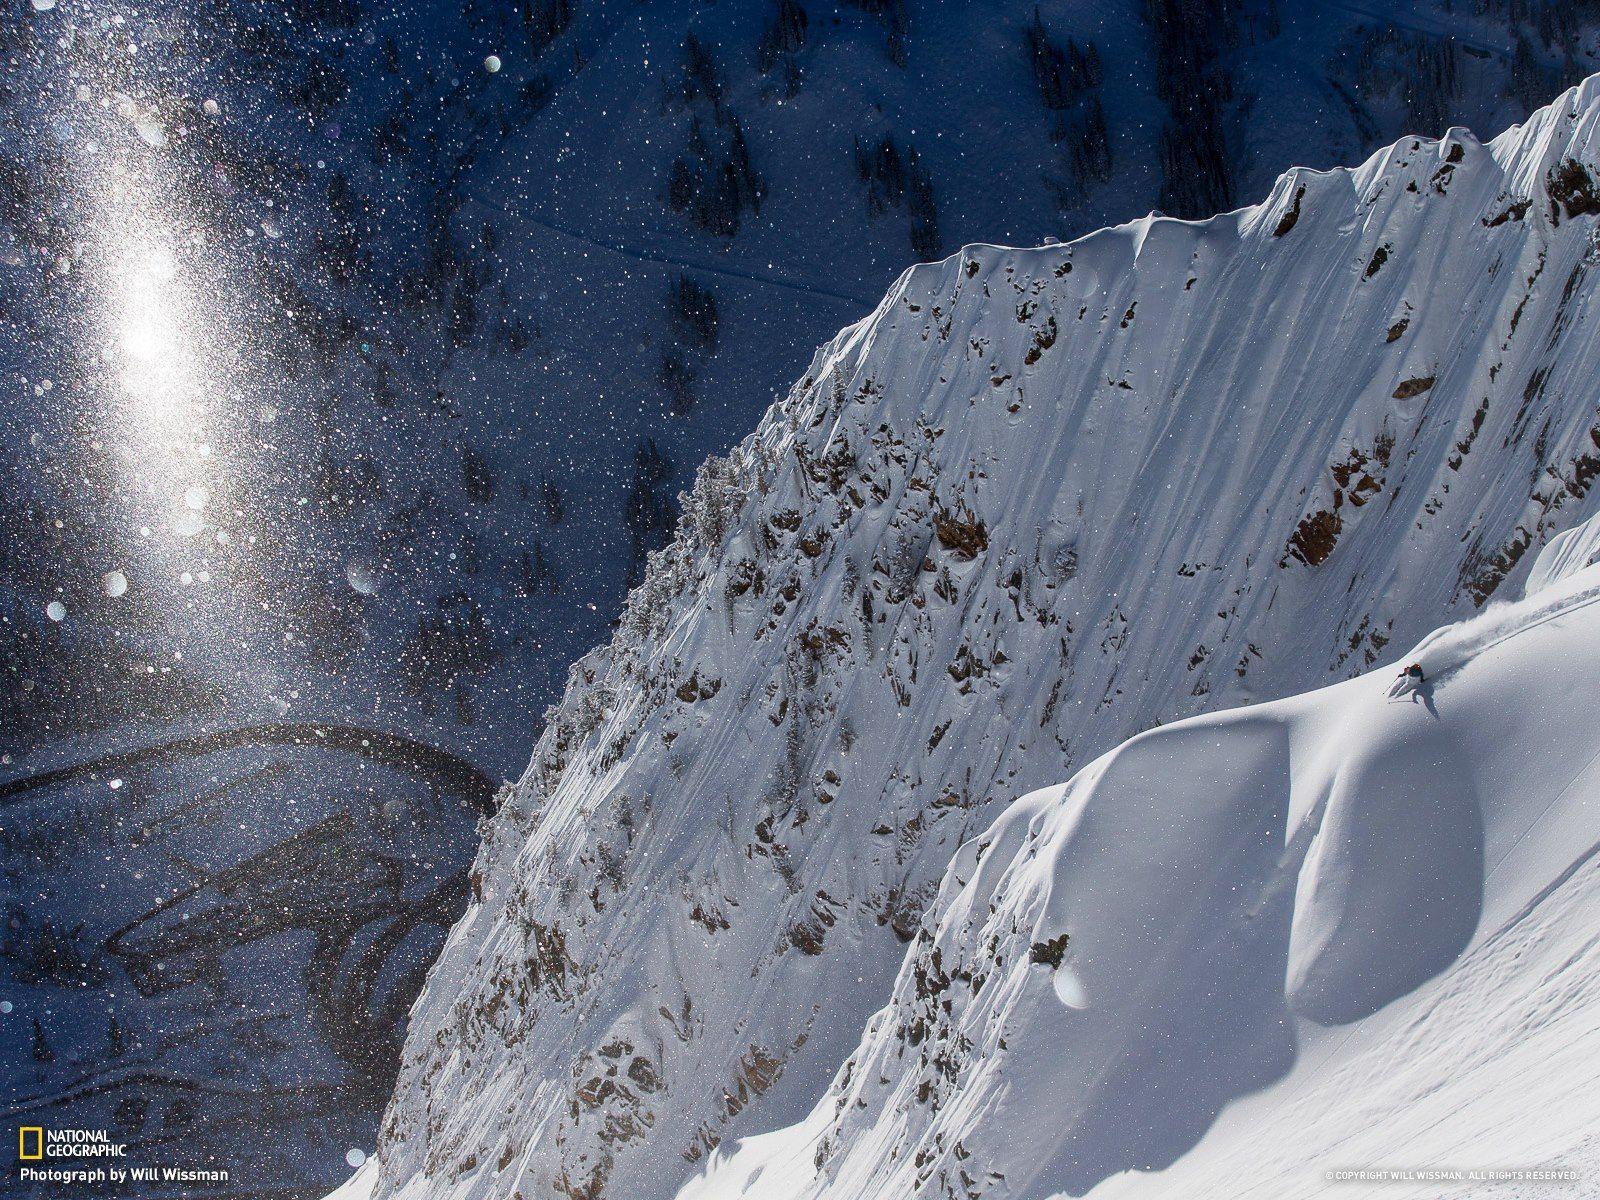 1598547 10152329791019826 597297403856327698 O Jpg 1600 1200 National Geographic Adventure Downhill Skiing Backcountry Skiing